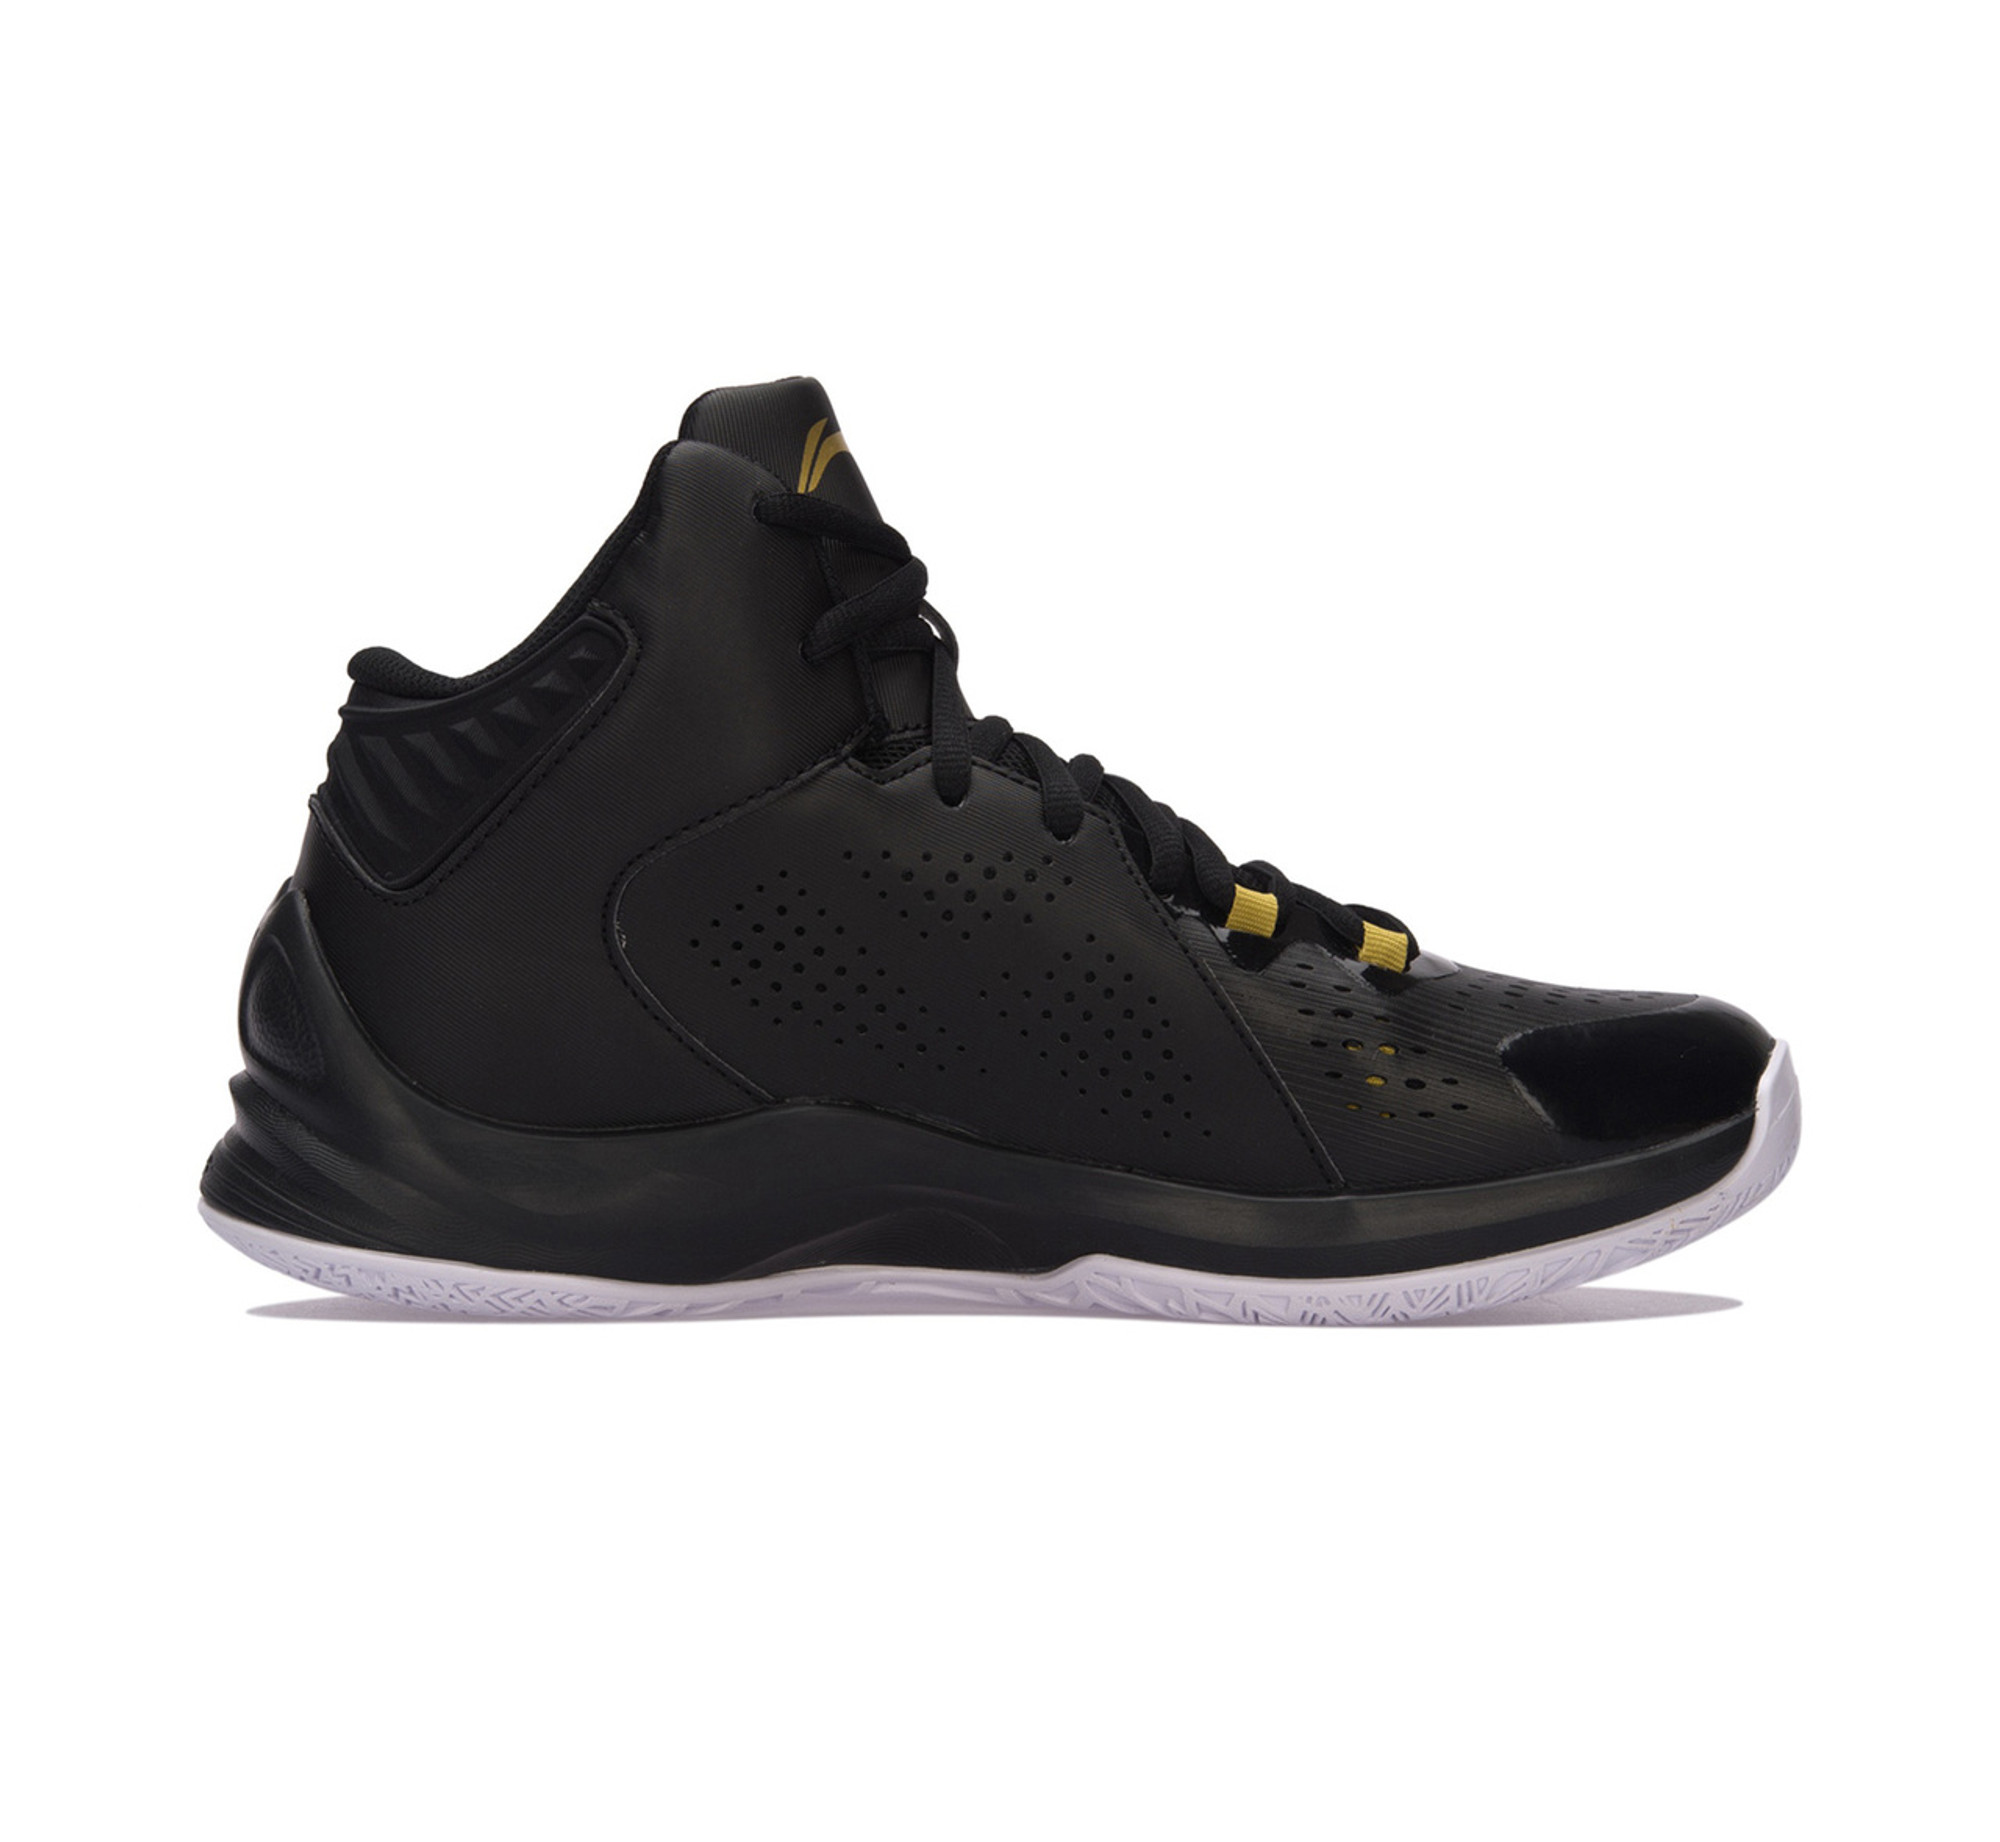 li ning basketball shoe sonic rush abpm031 2 shop online now at